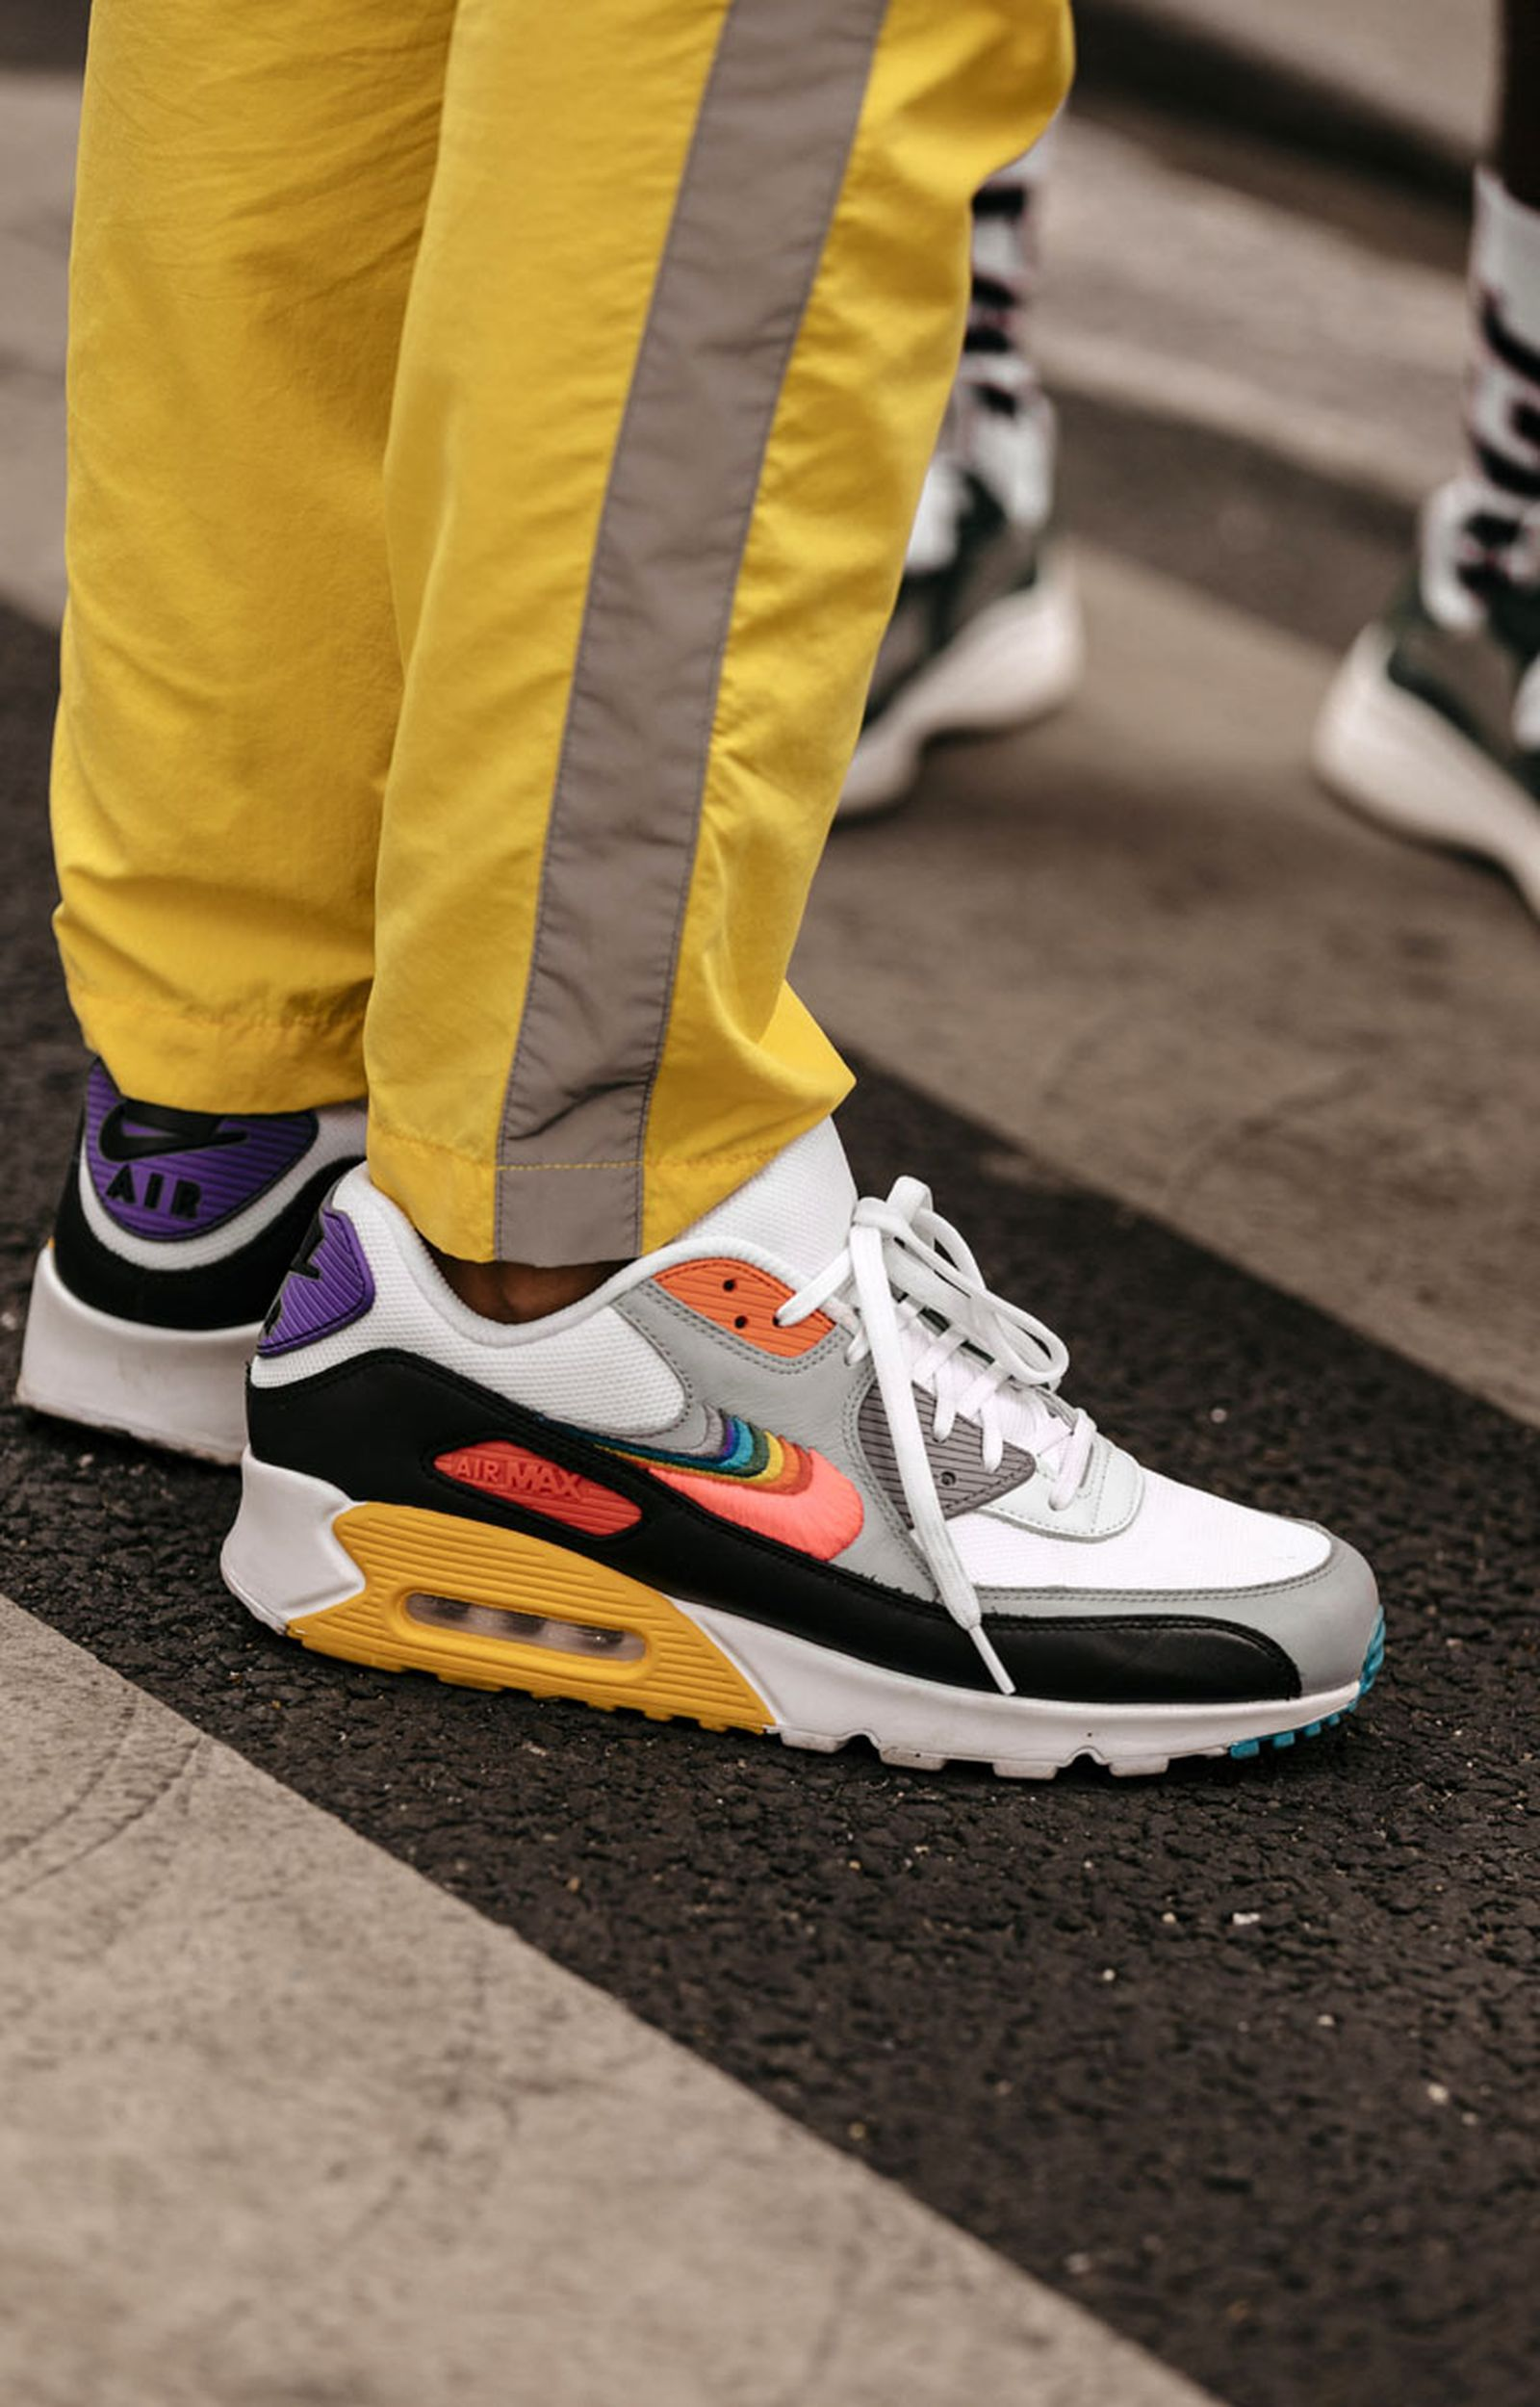 paris fashion week ss20 sneakers 015 Nike comme des garcons li ning